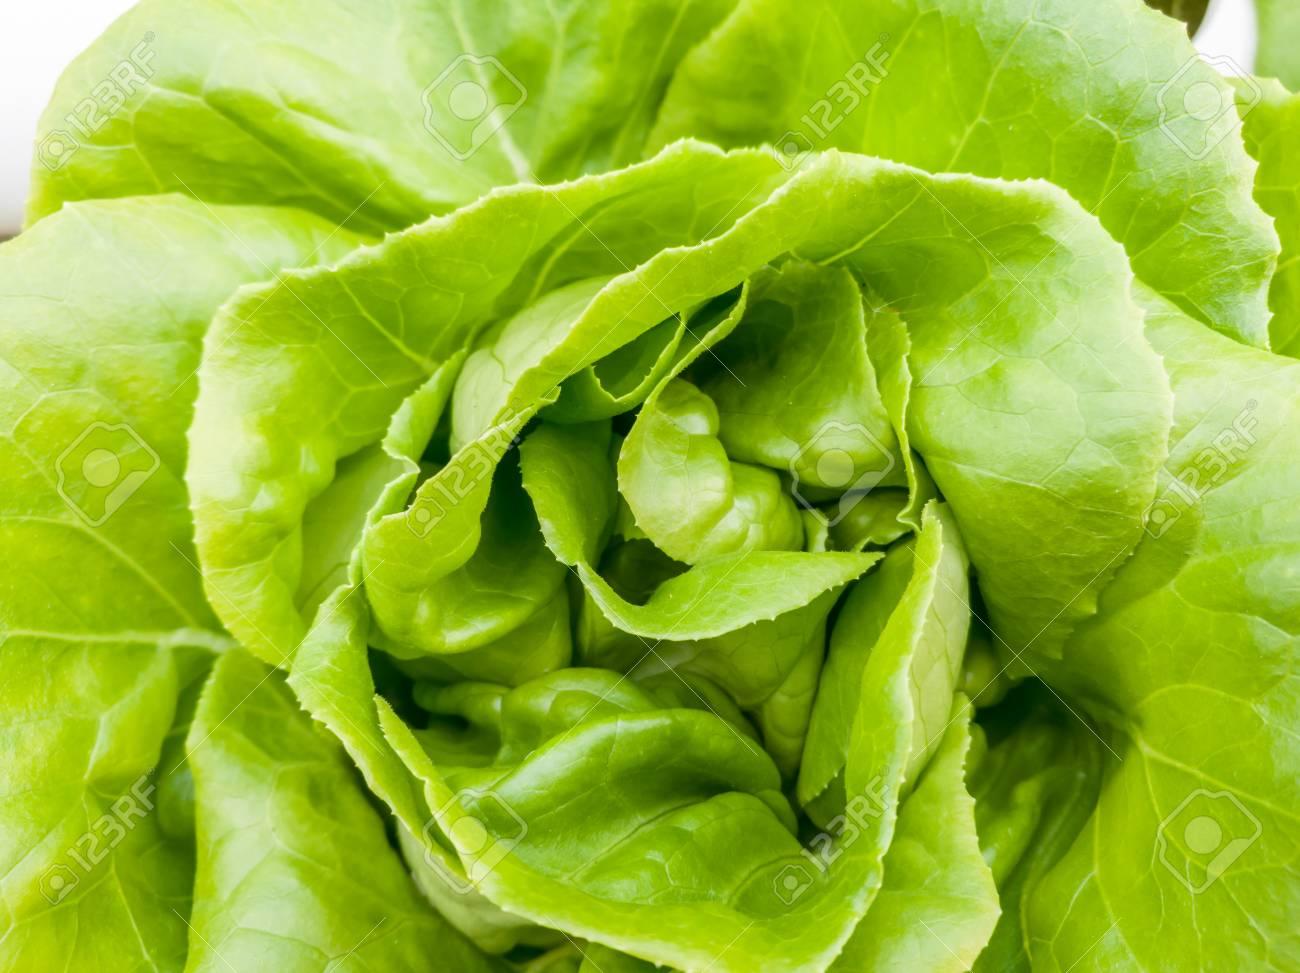 Salad vegetable green fresh lettuce in farm close up - 106236406